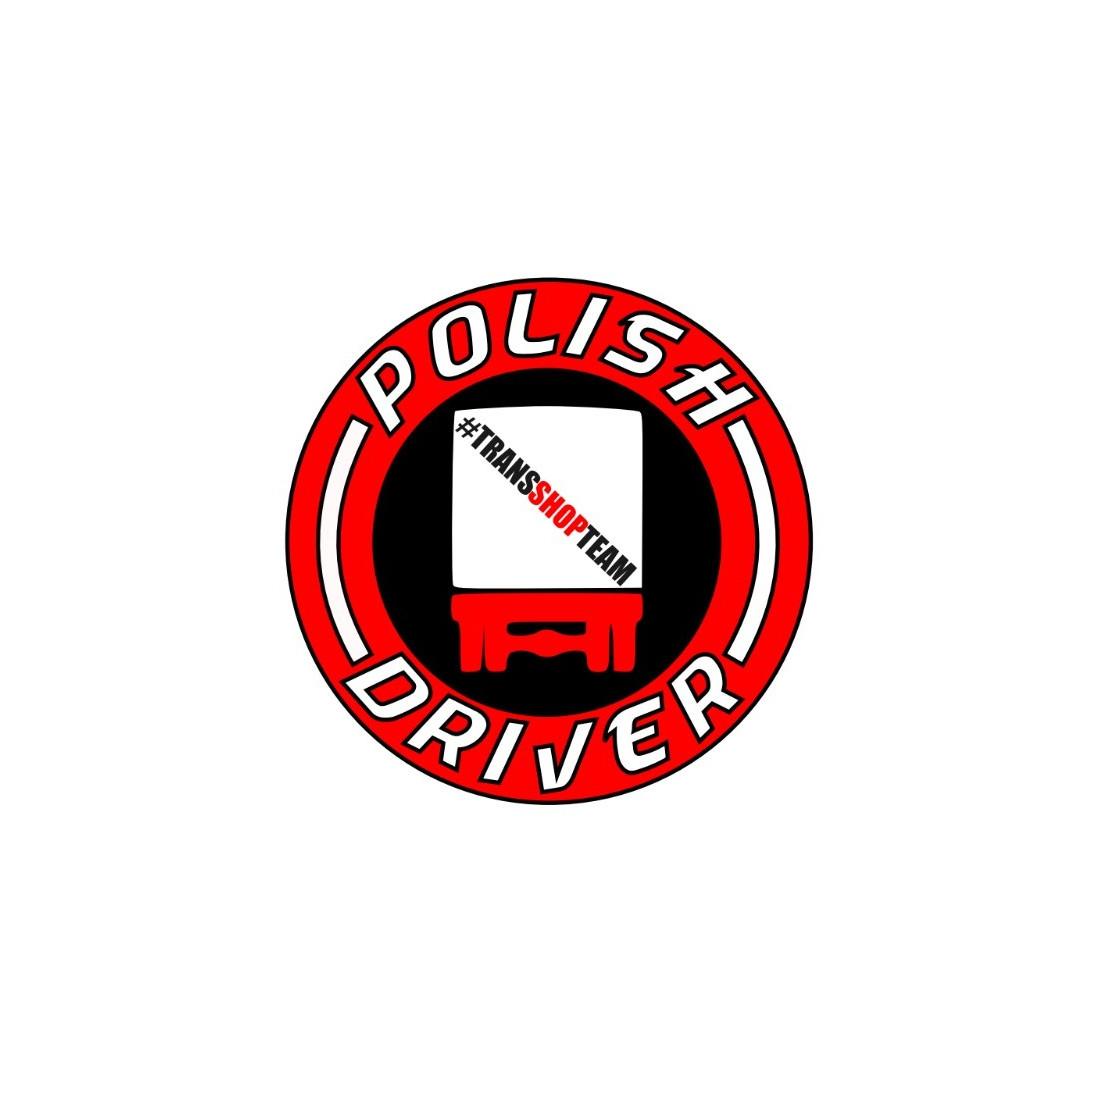 POLISH DRIVER NAKLEJKA WLEPA 10 CM